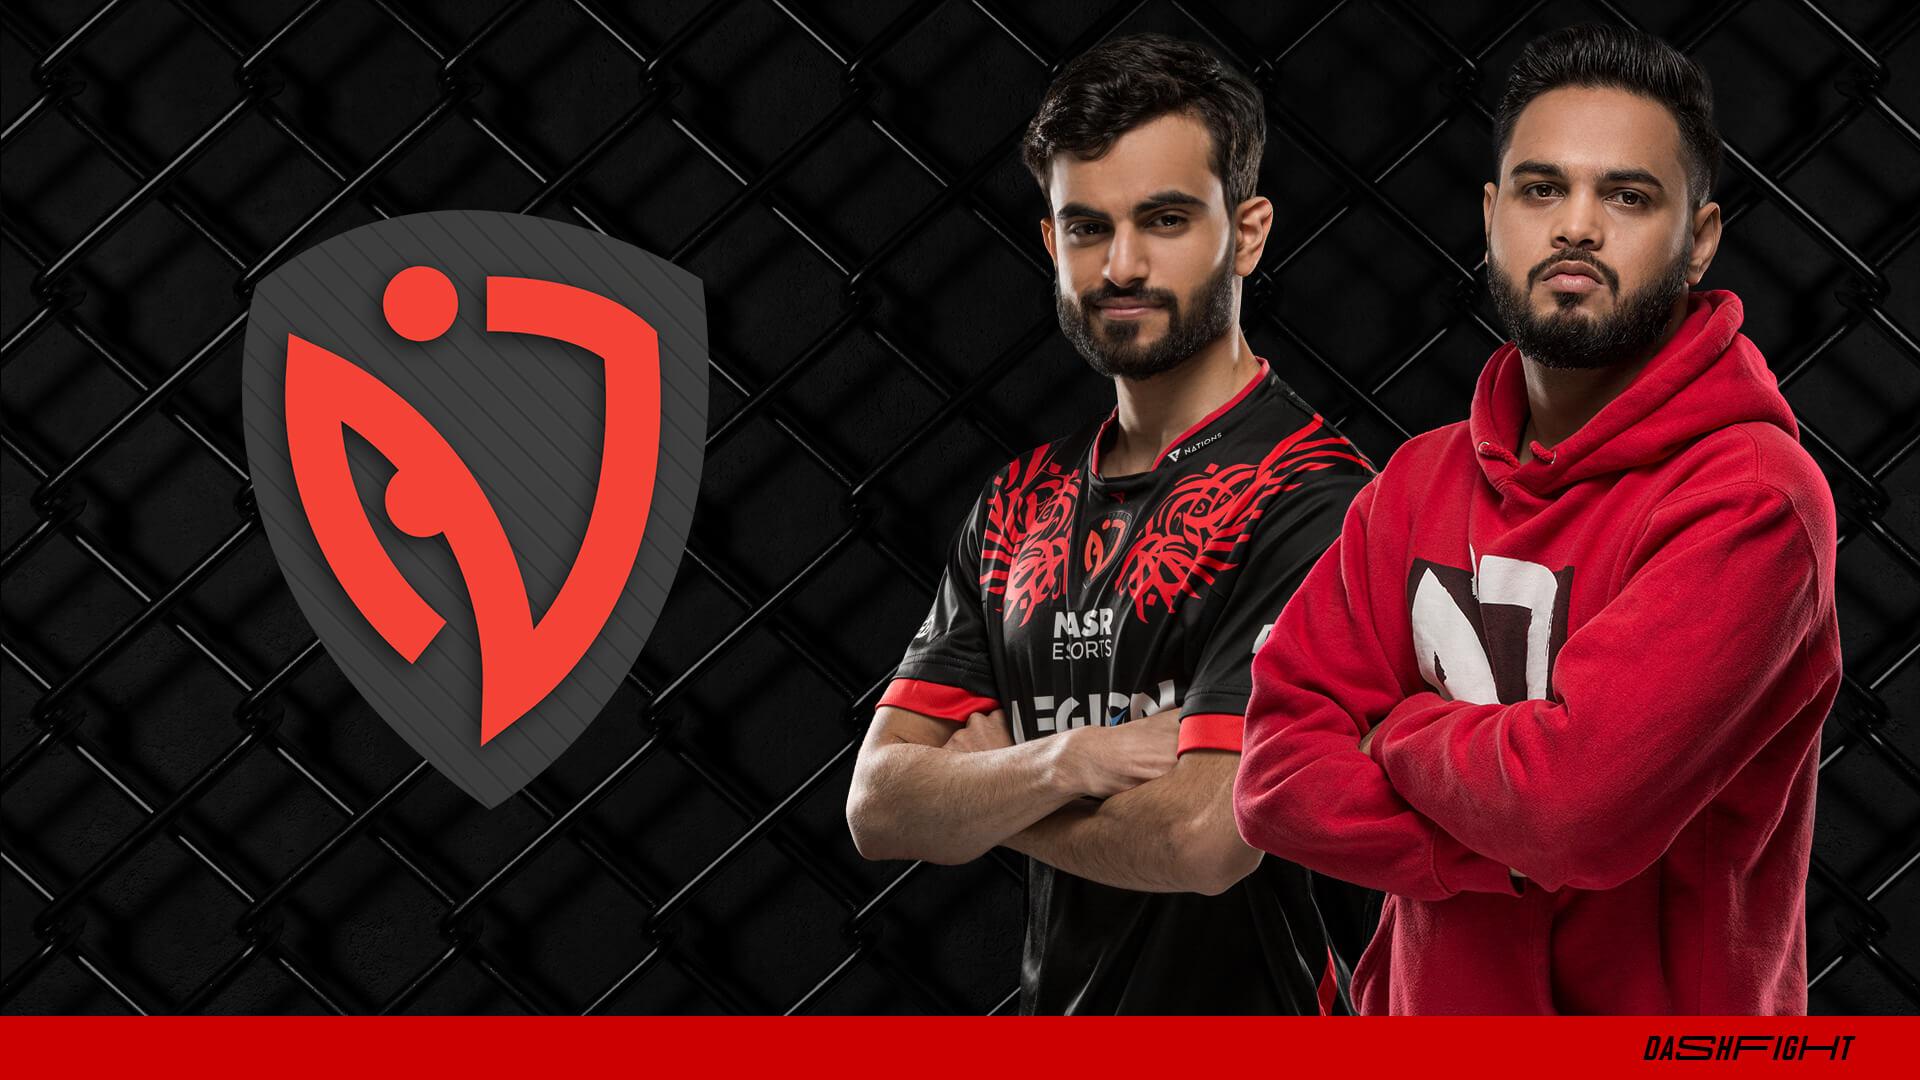 NASR Esports Tekken Master and Bilal